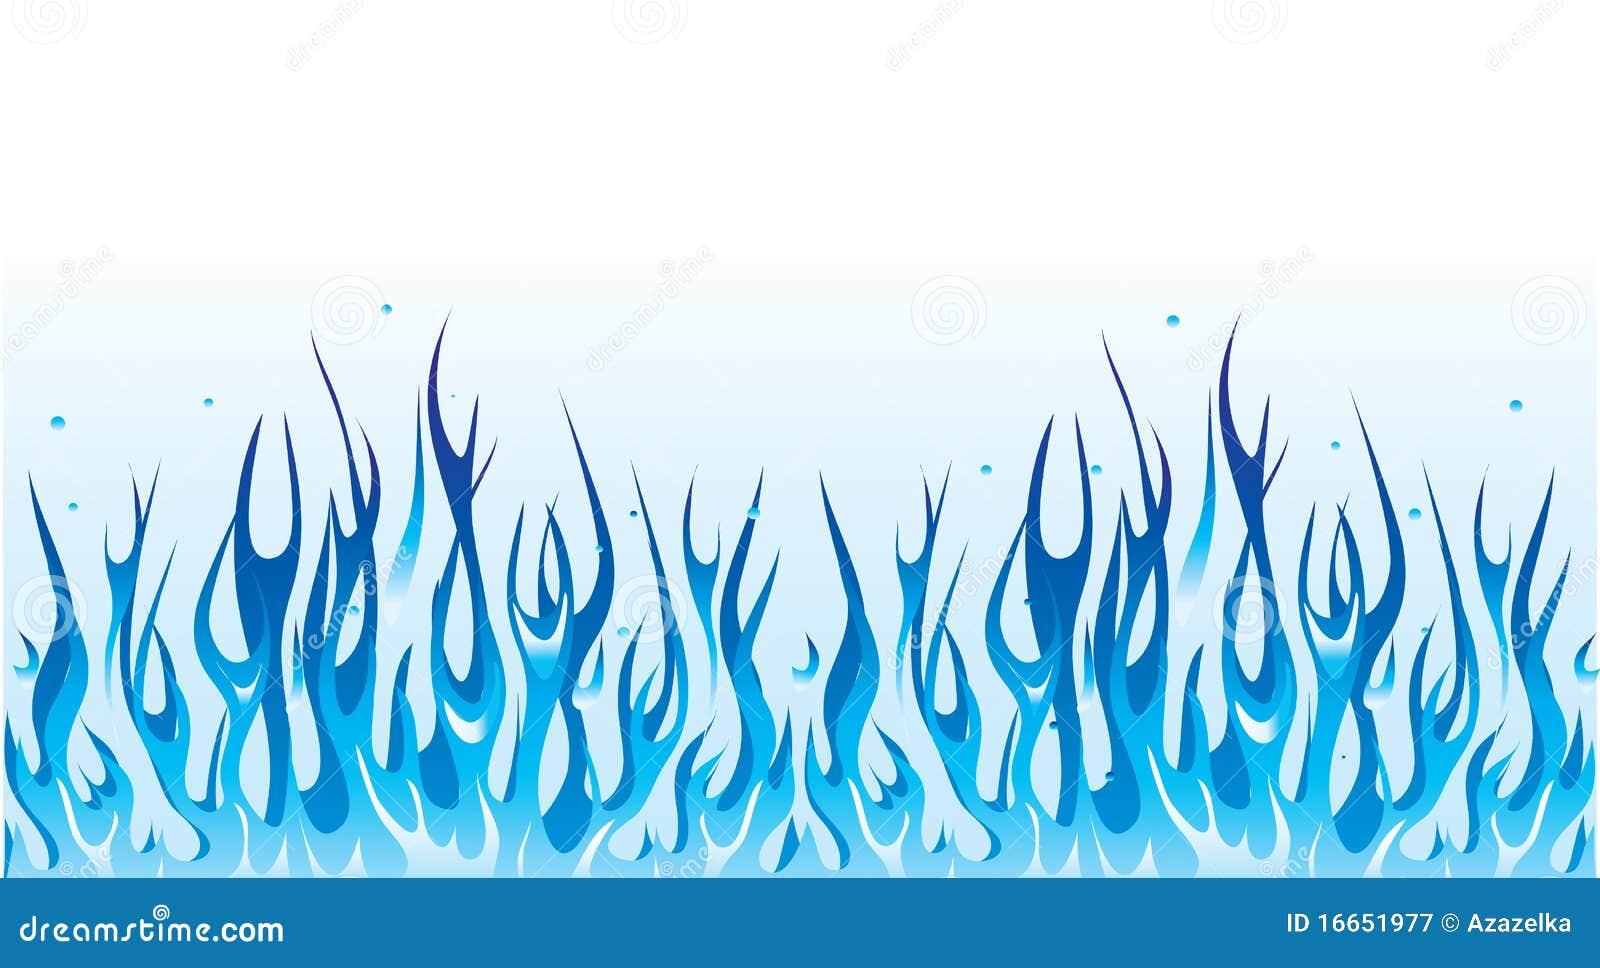 Blue fire border stock vector. Illustration of speed ...